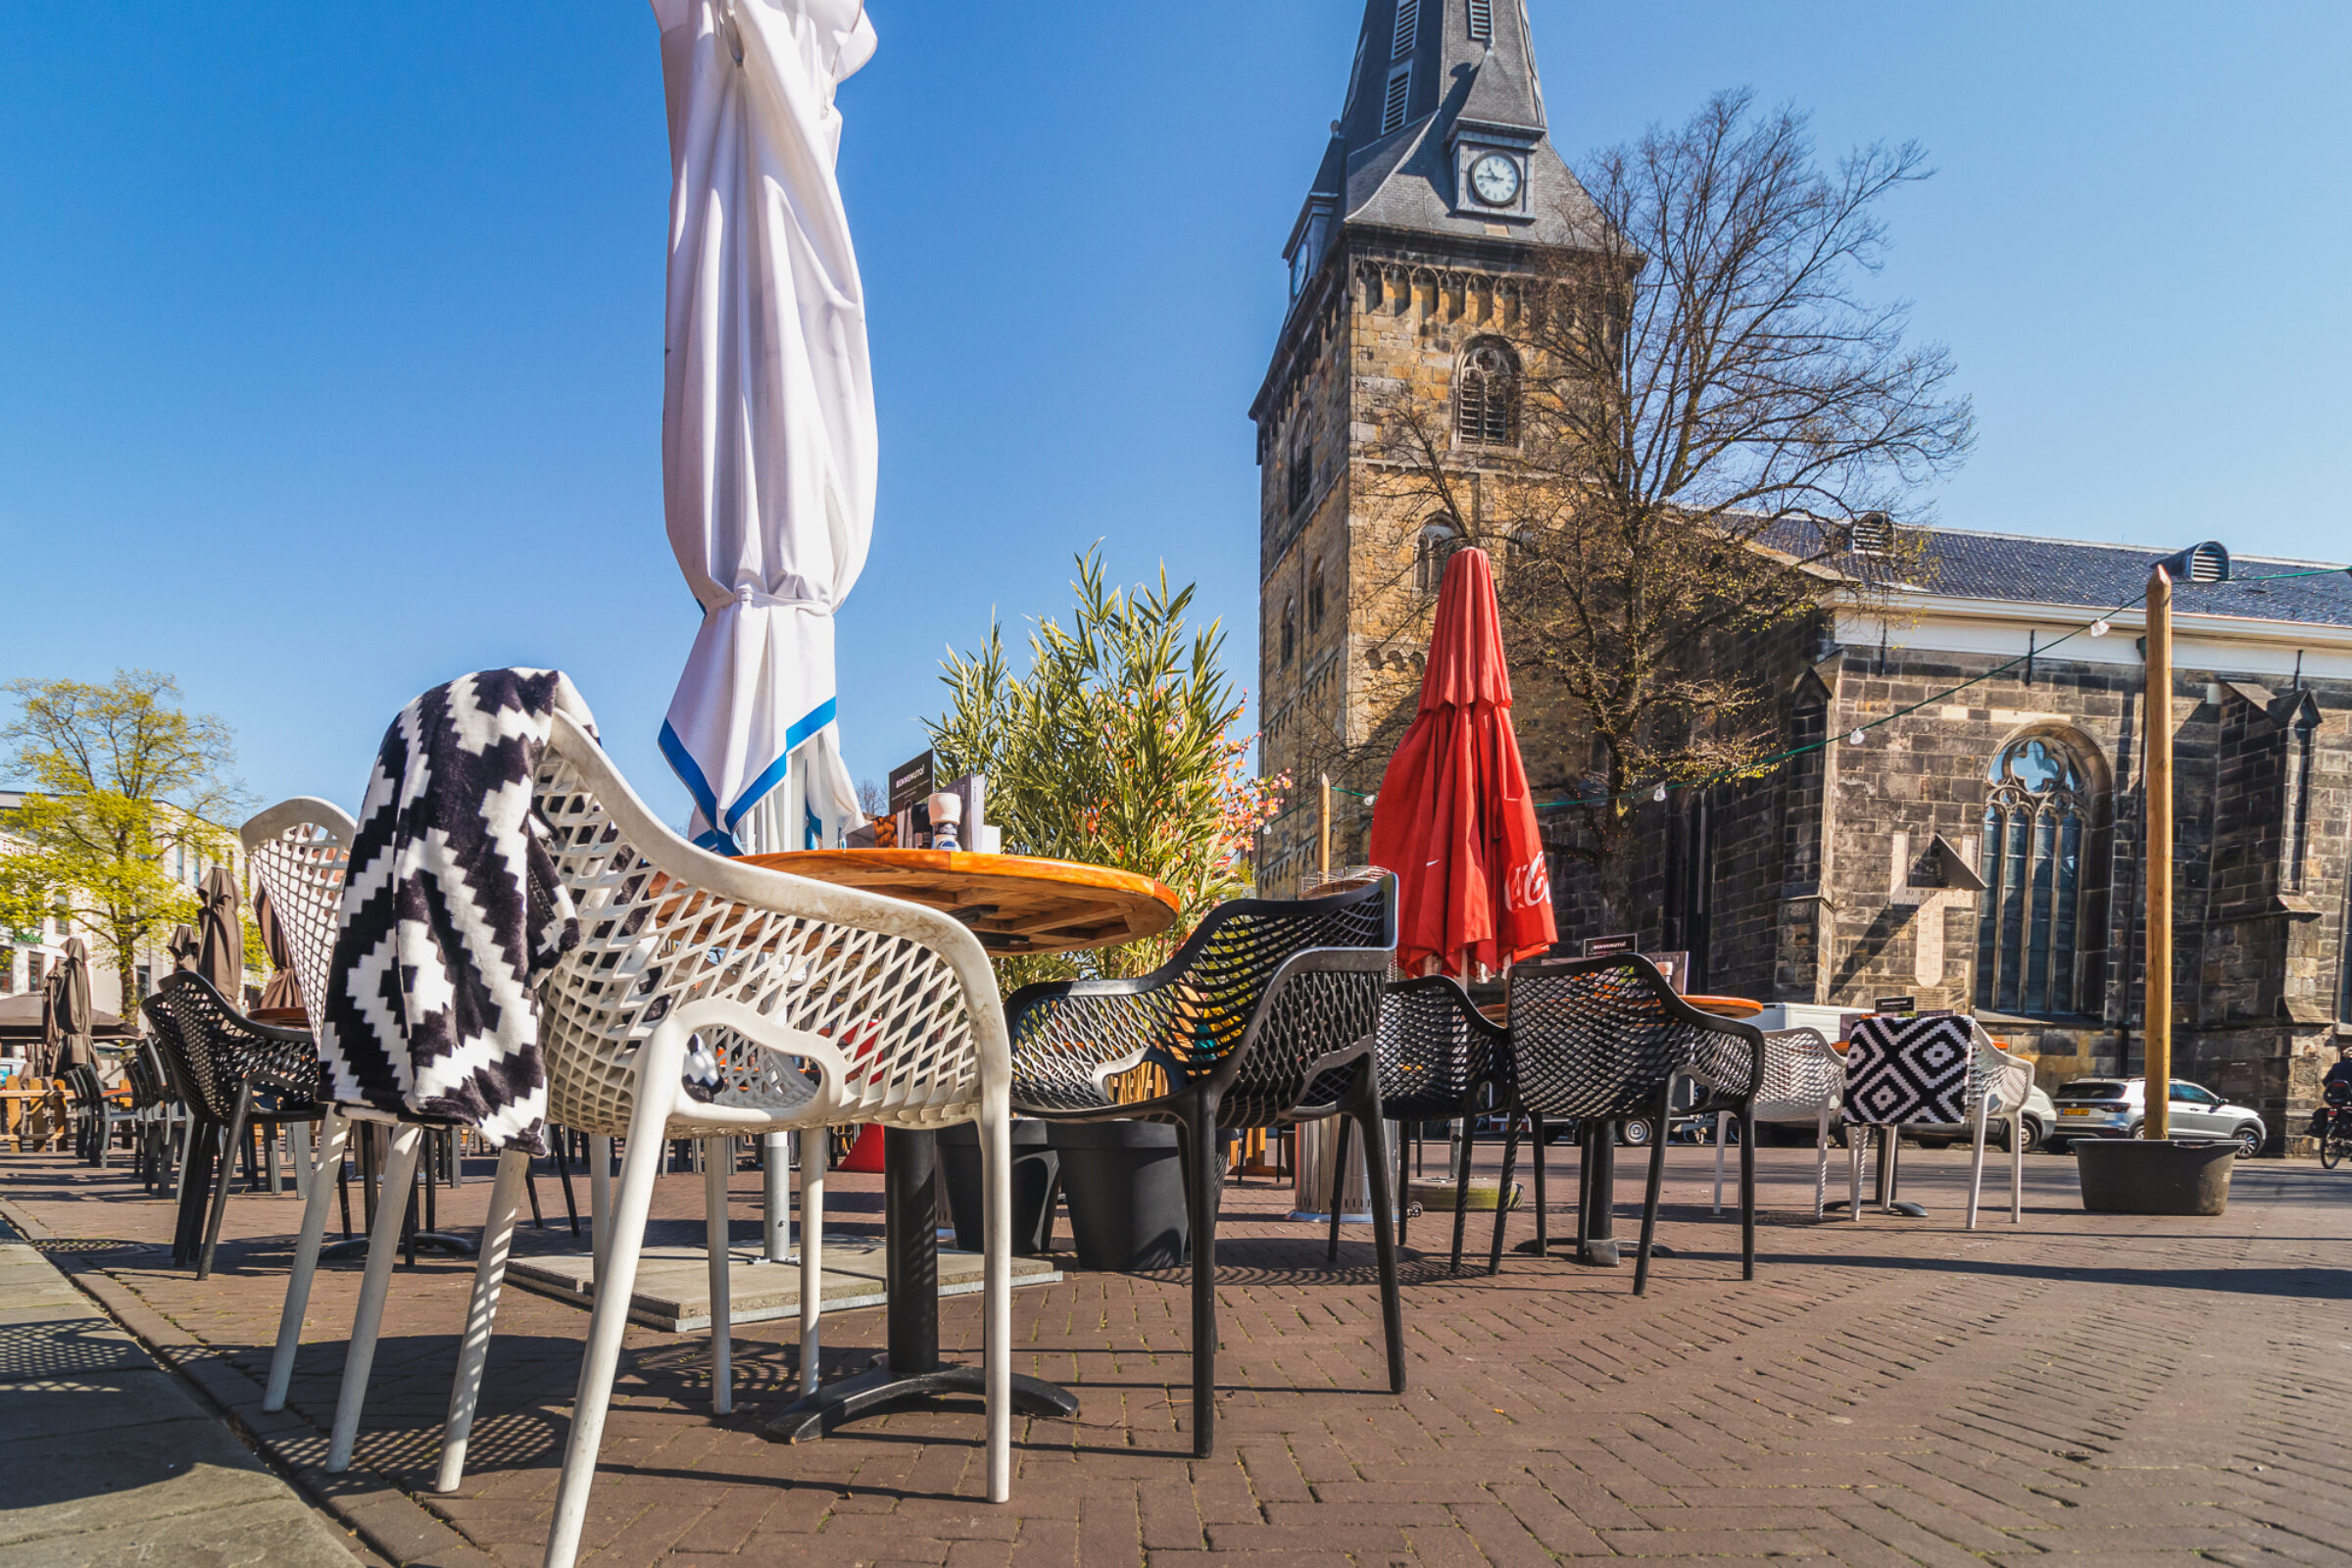 Grote Terrassen Oude Markt Enschede